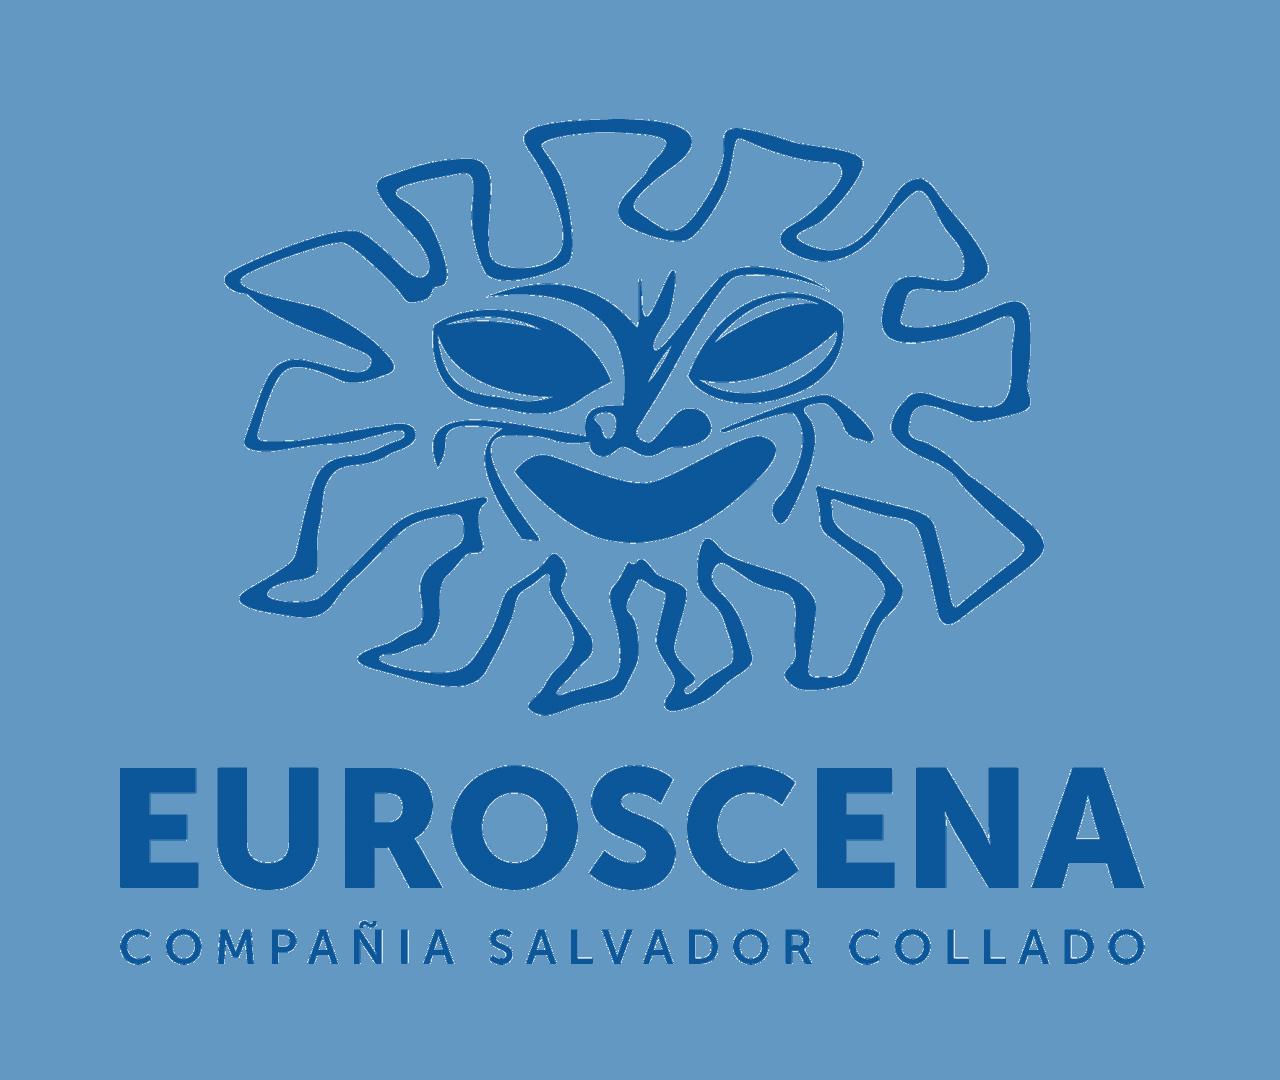 Euroscena